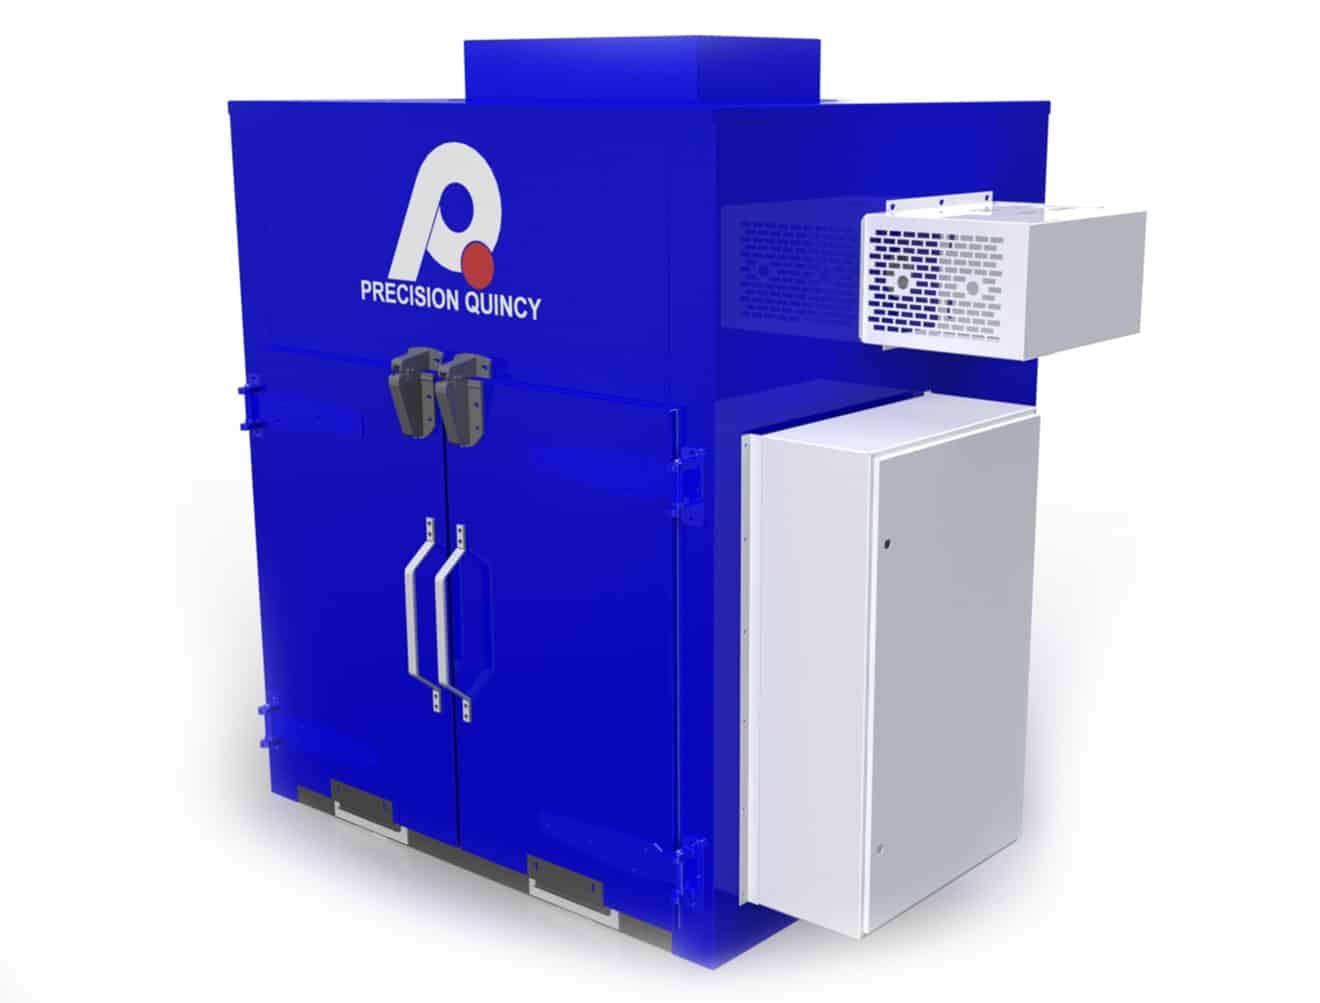 Precision Quincy oven